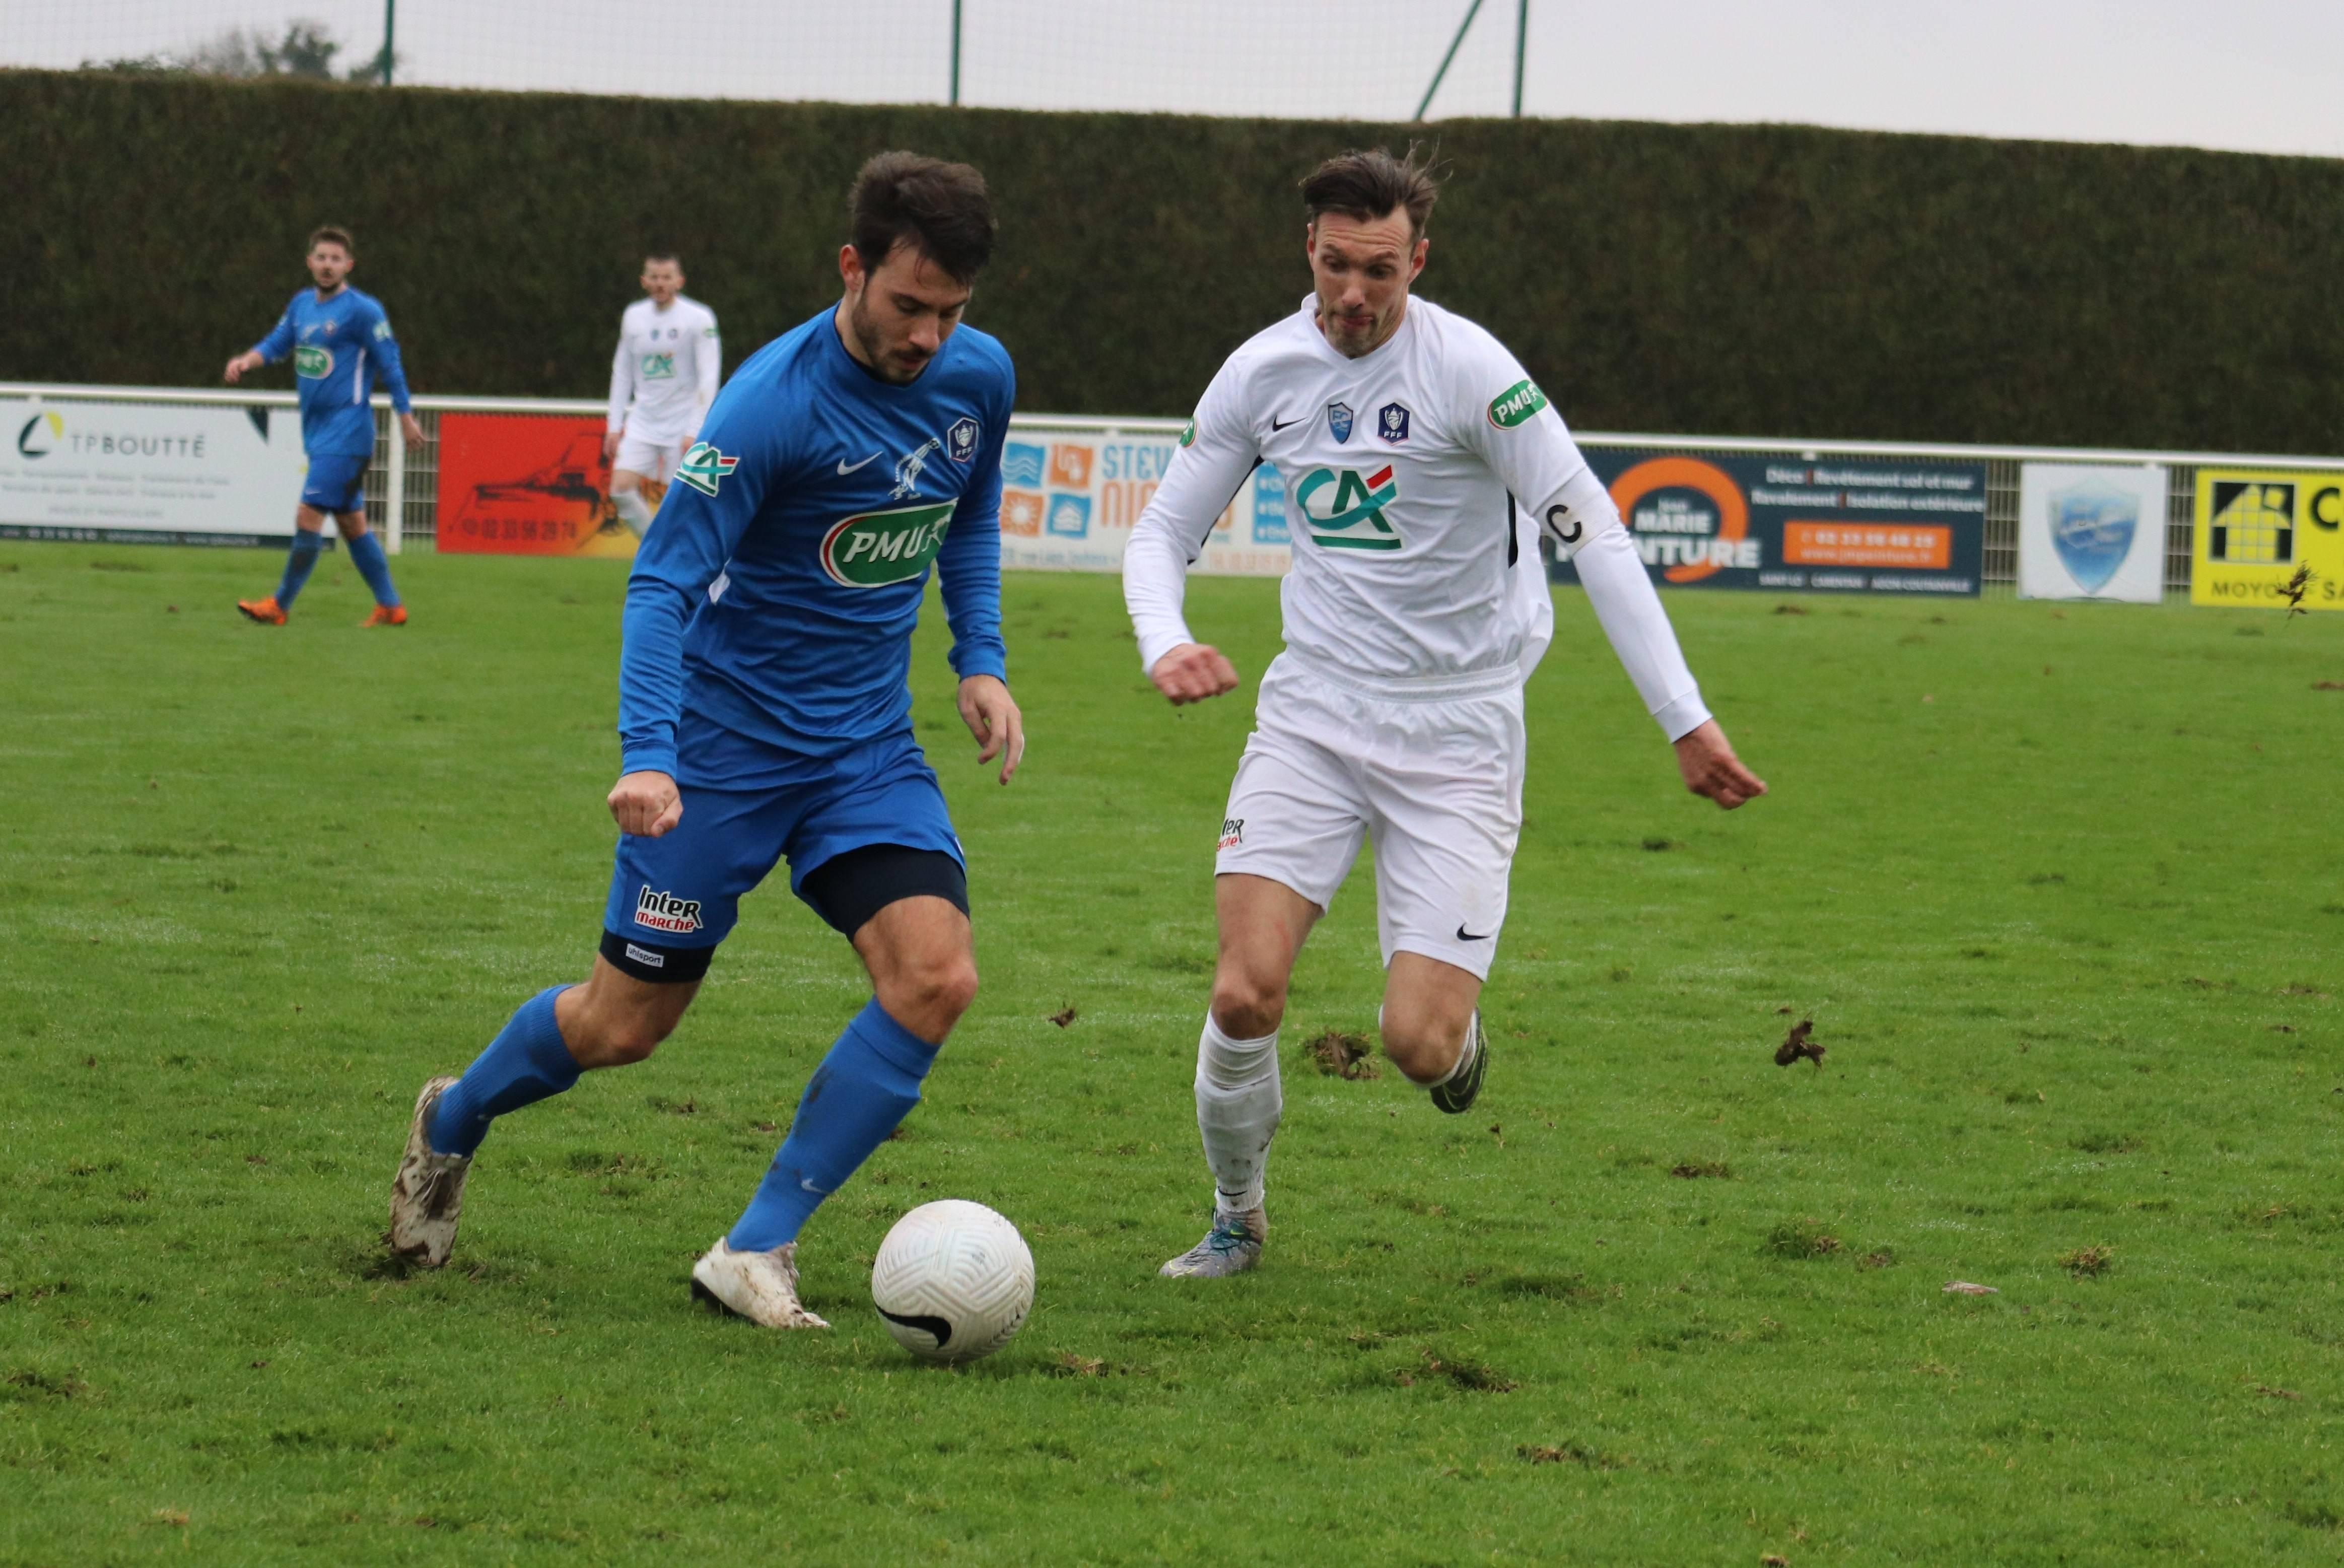 FC Saint-Lô Manche (N3) - AF Virois (N3)